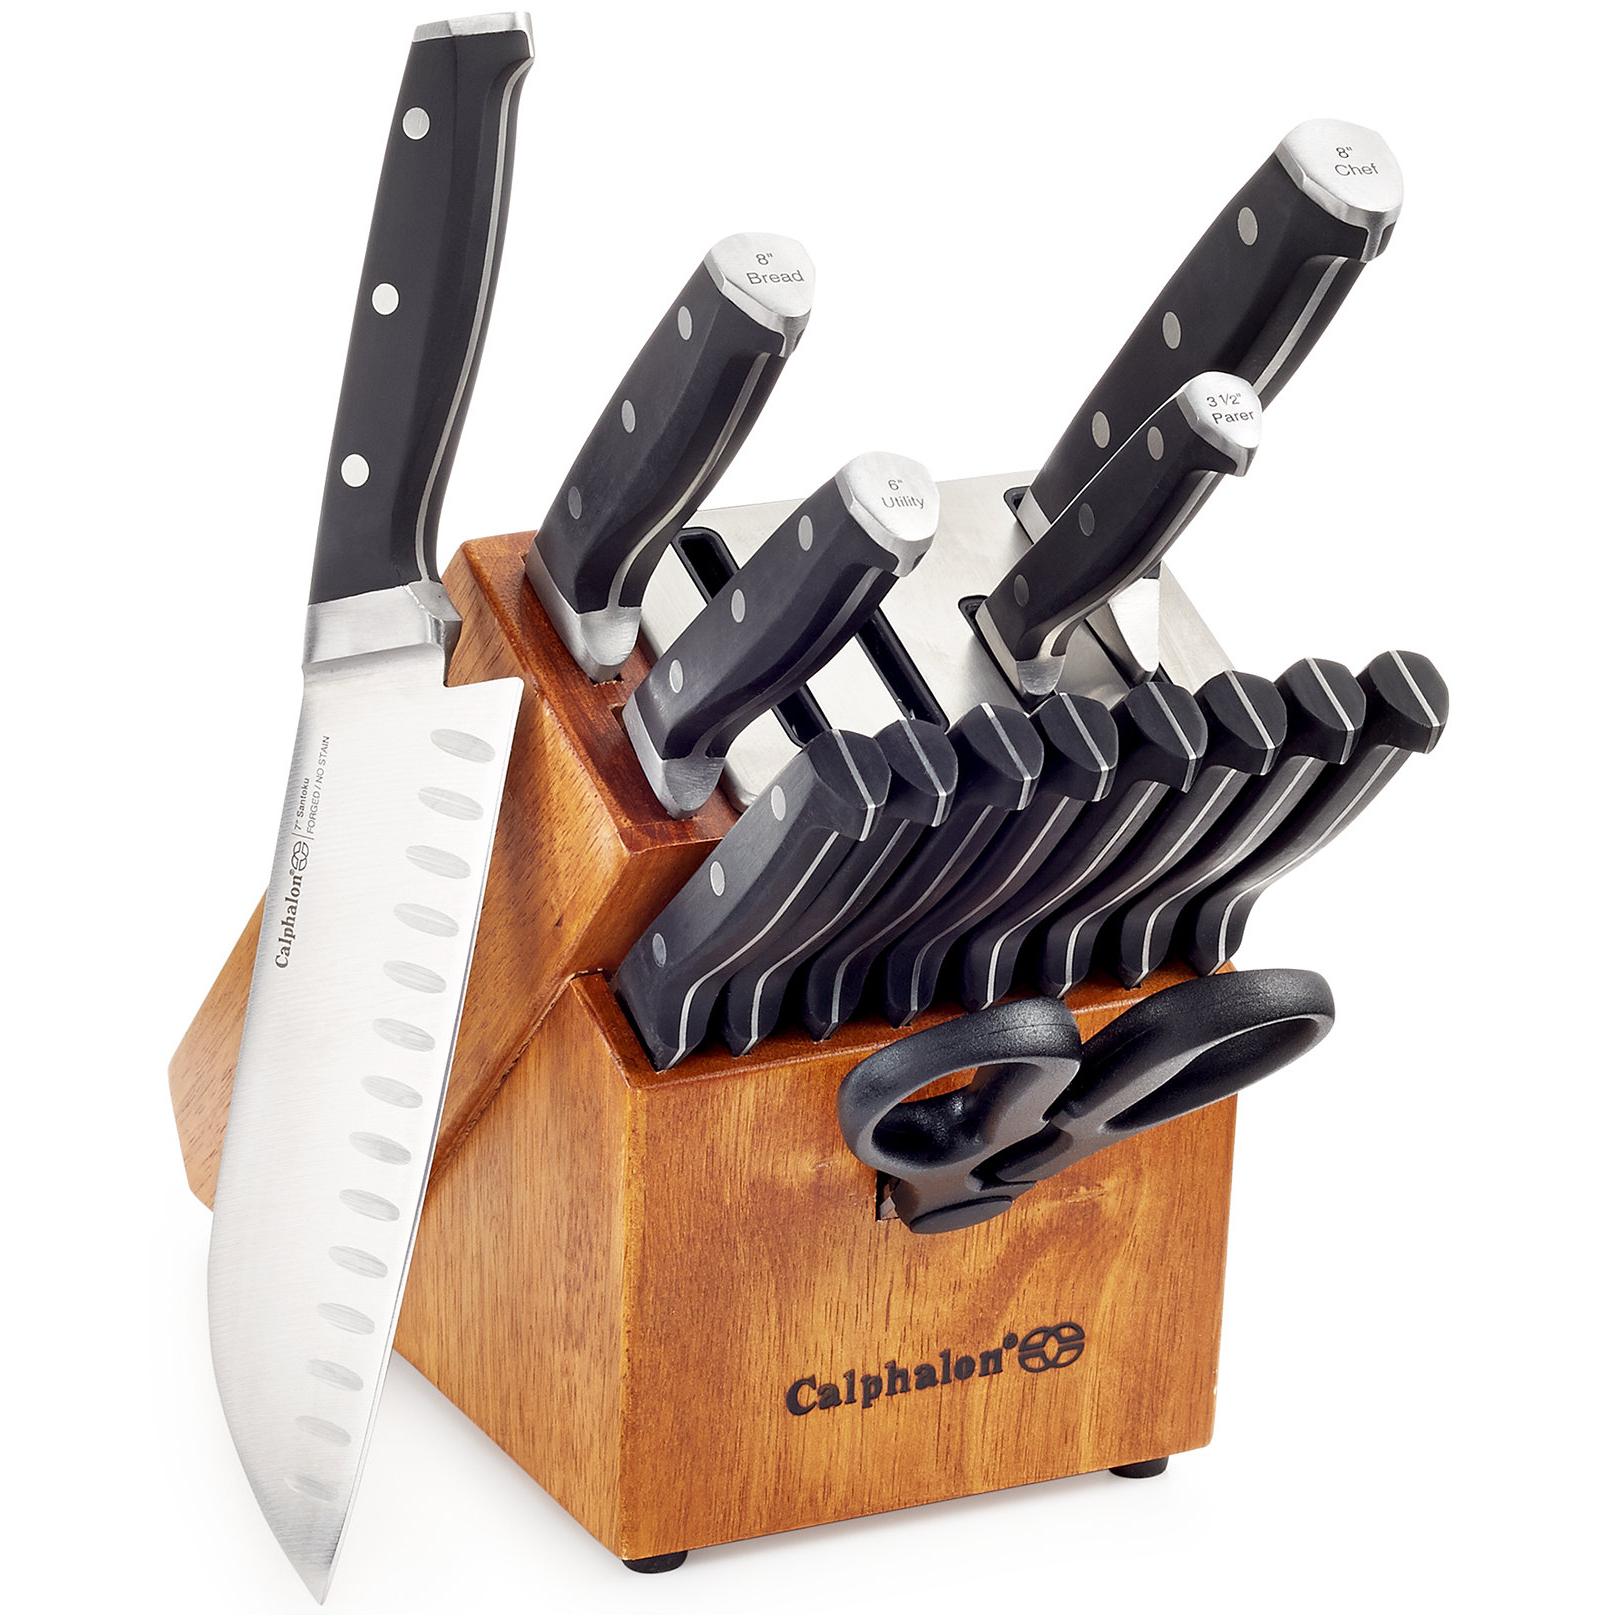 Calphalon Cutlery